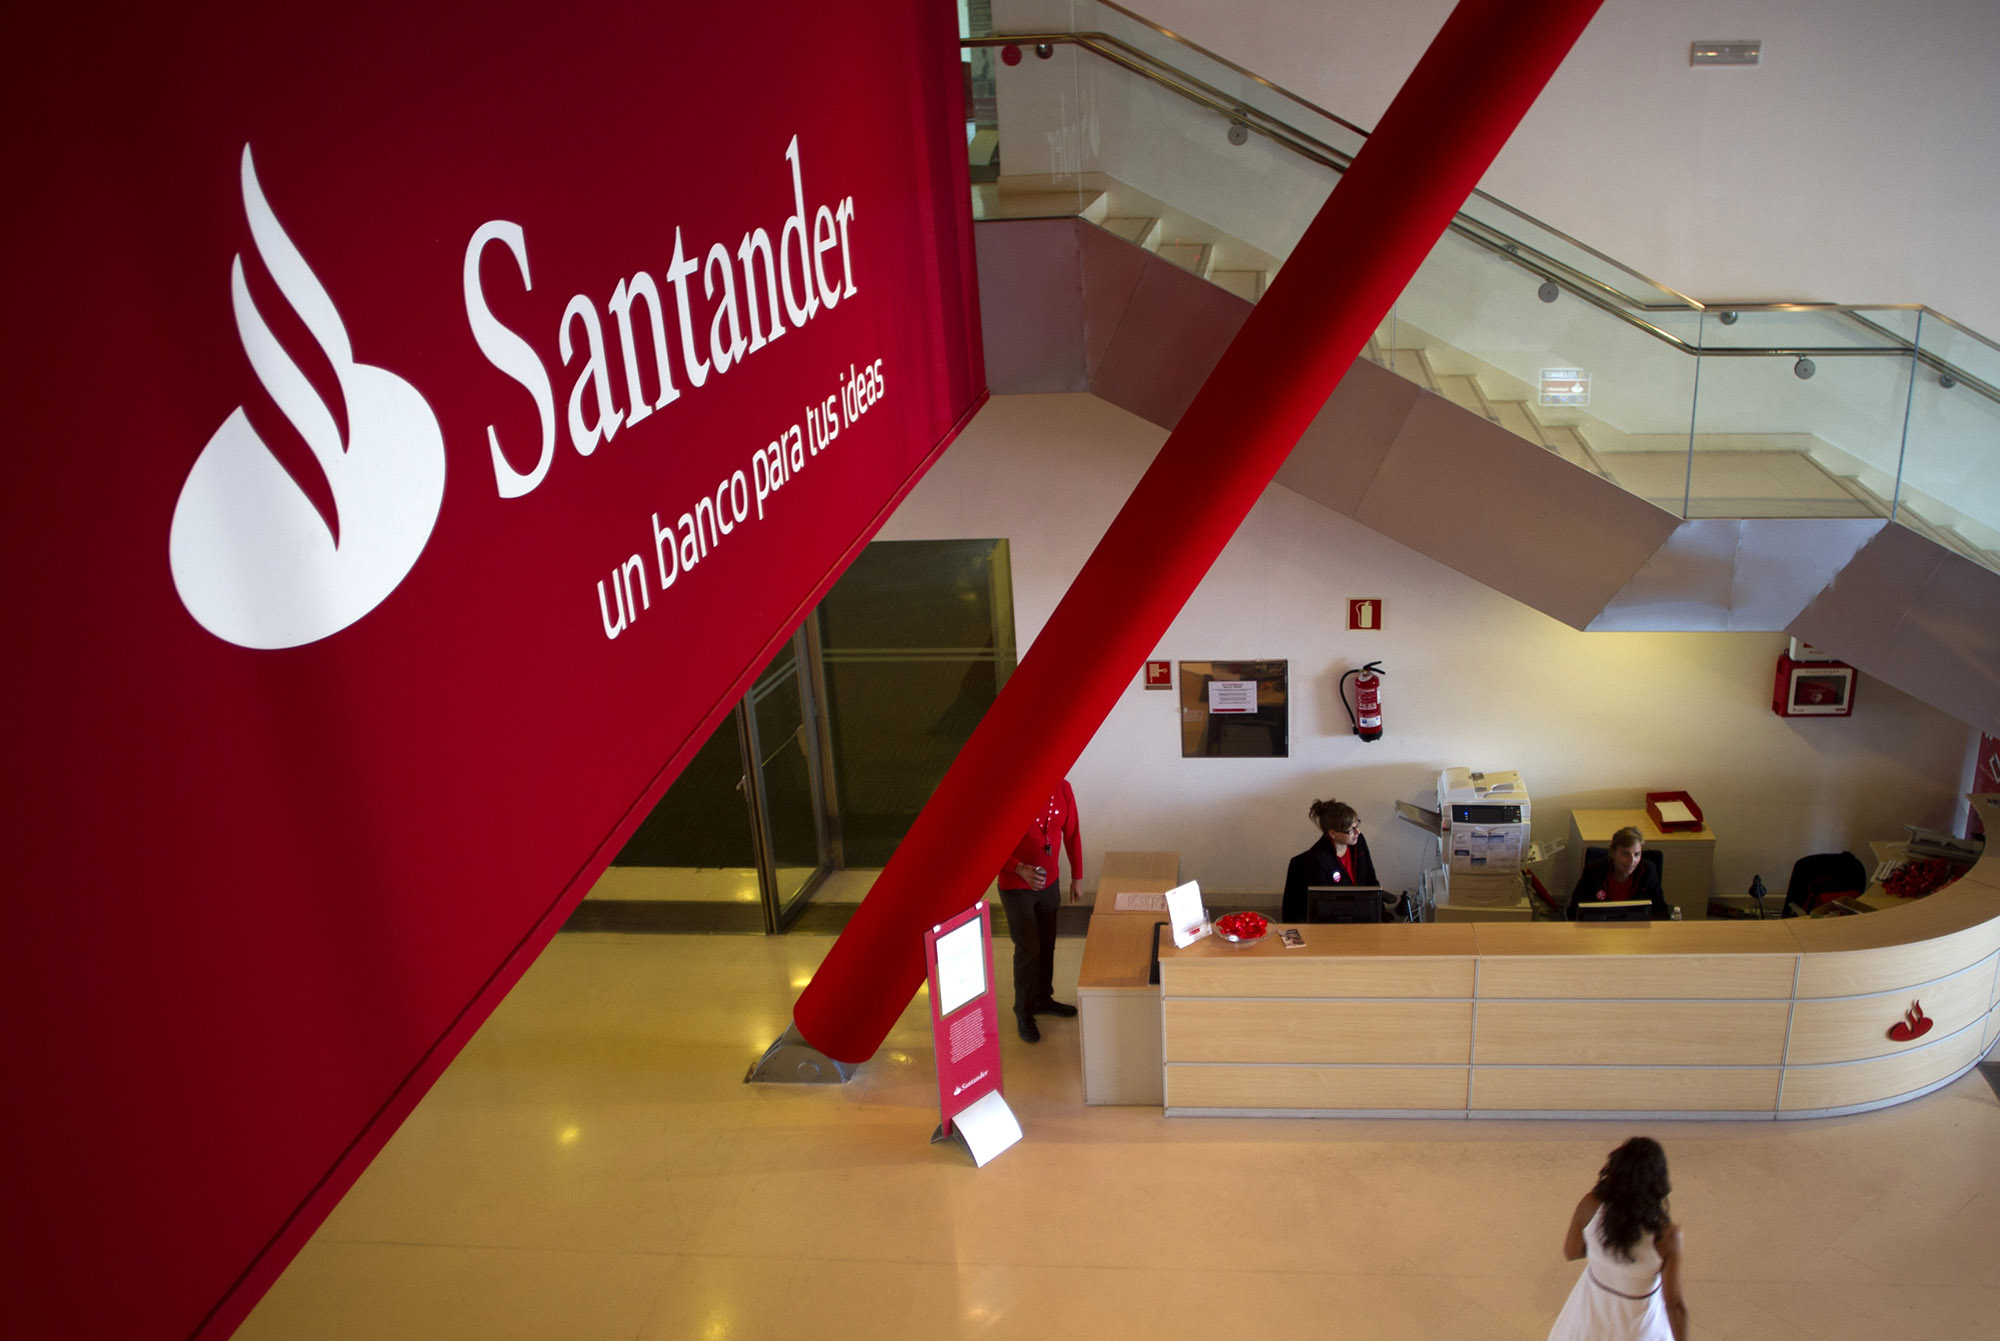 Santander, unions reach agreement on 3223 job cuts in Spain